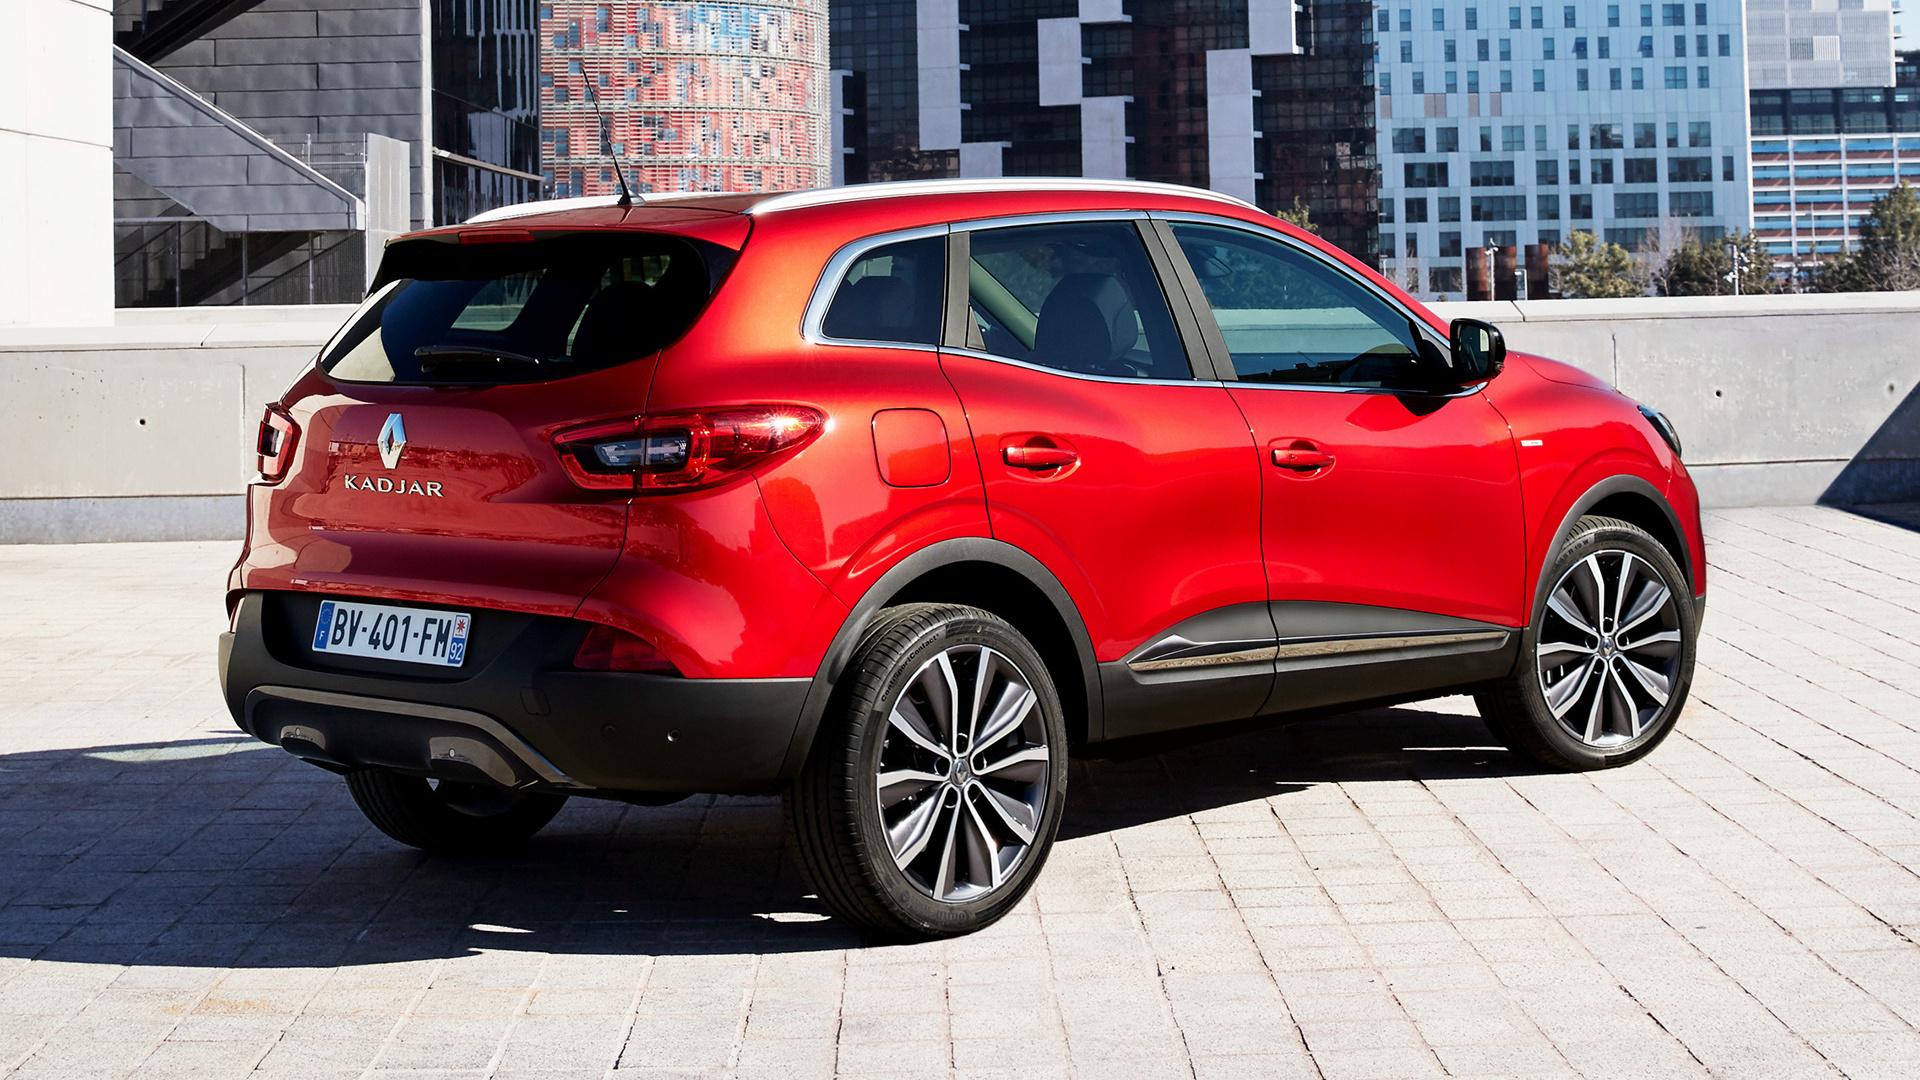 2015 Renault Kadjar Bose Wallpapers And HD Images Car